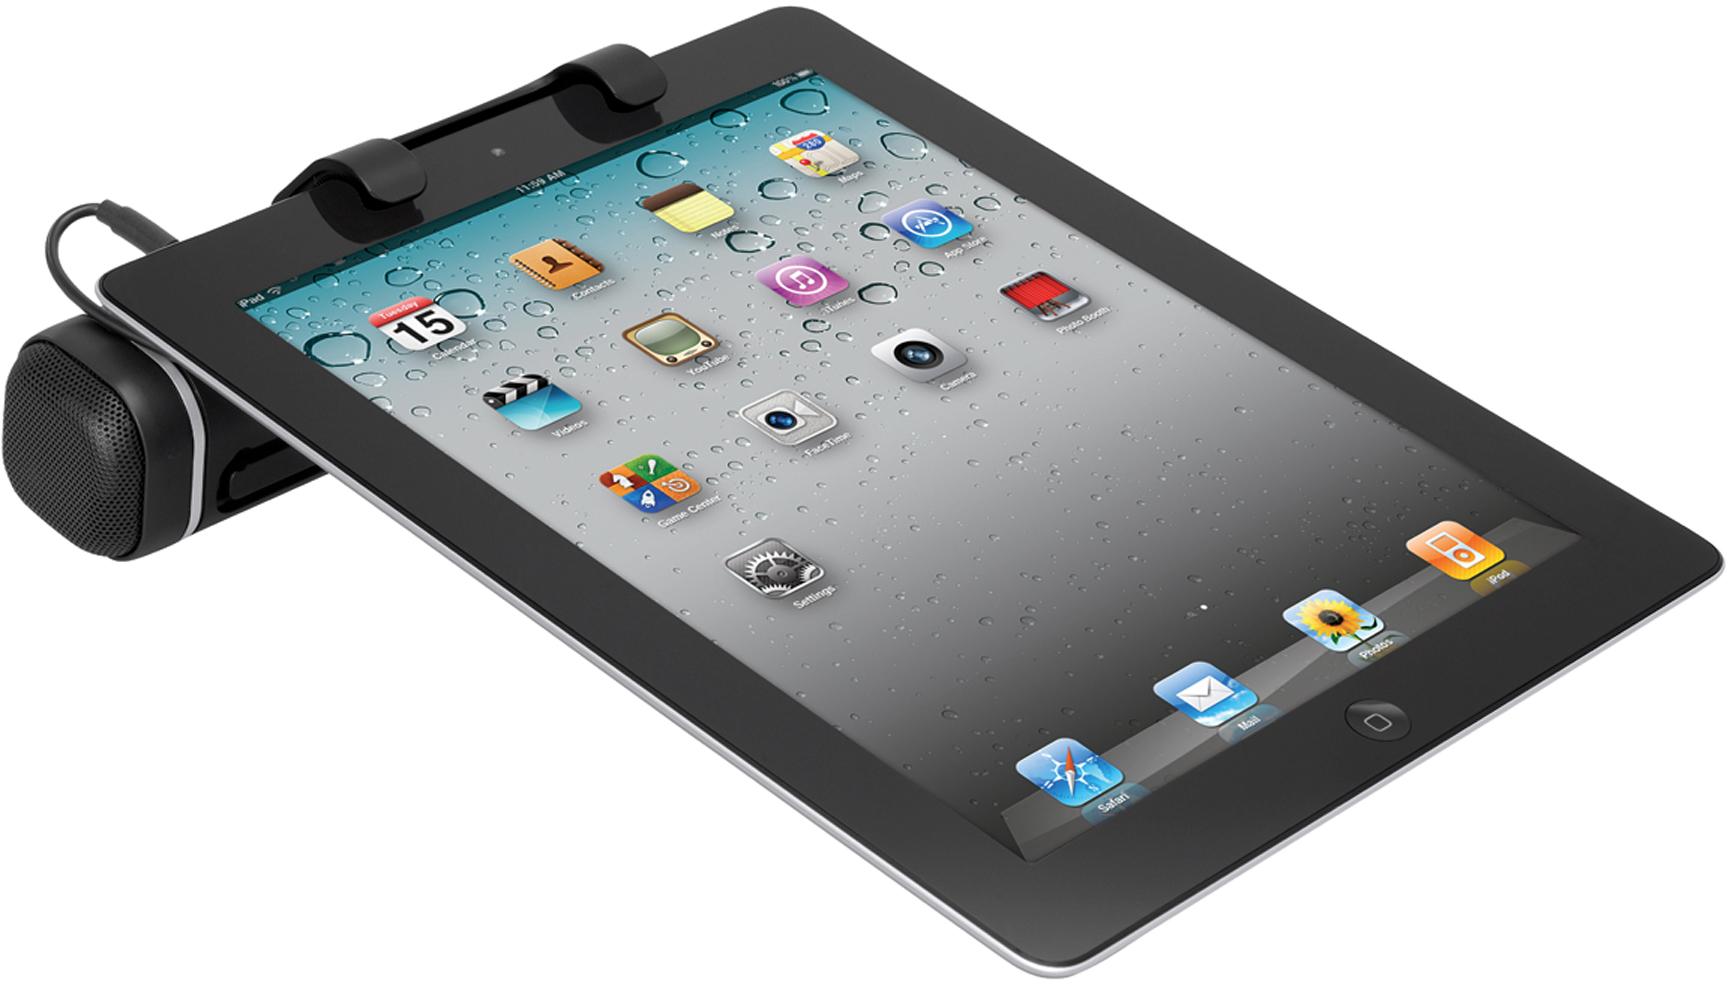 Ipad accessories bh explora multi device charging dock publicscrutiny Images